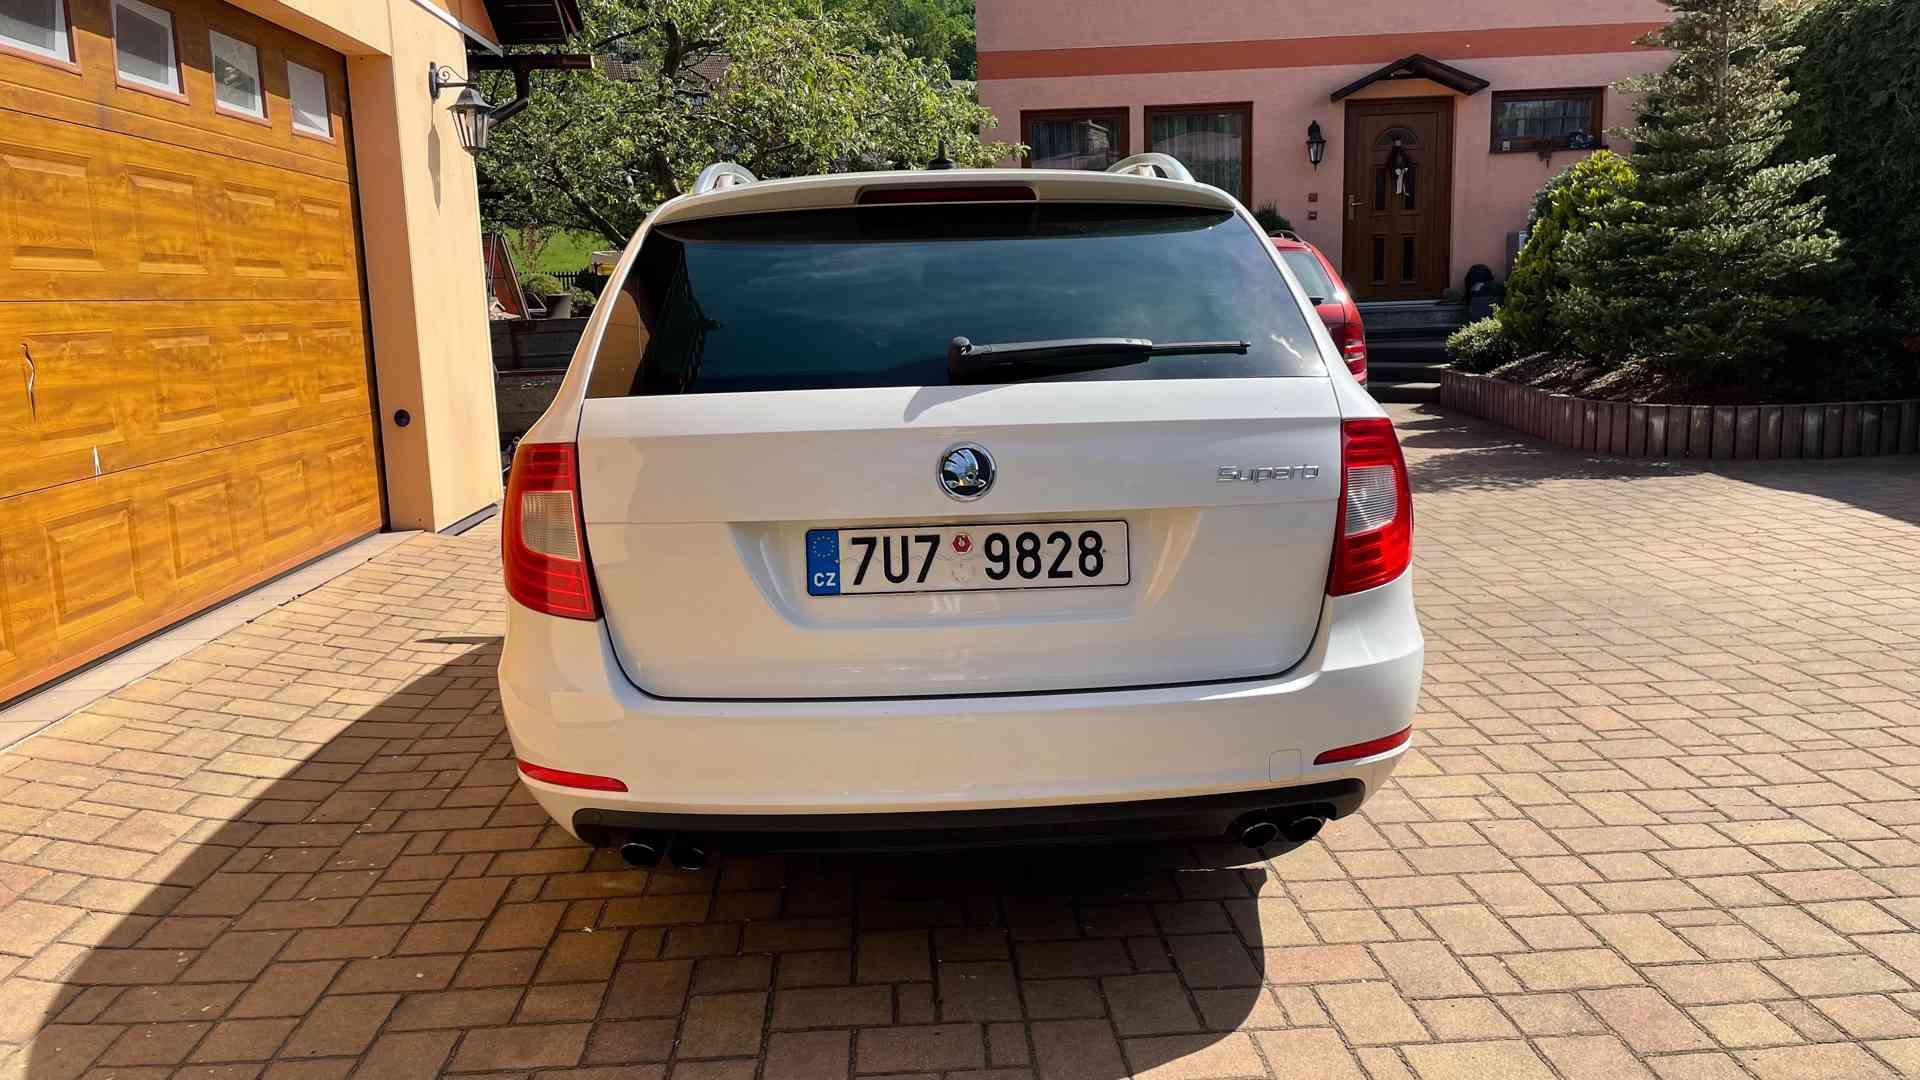 Škoda Superb 3.6 FSI V6 191kW 4x4 L&K - foto 4